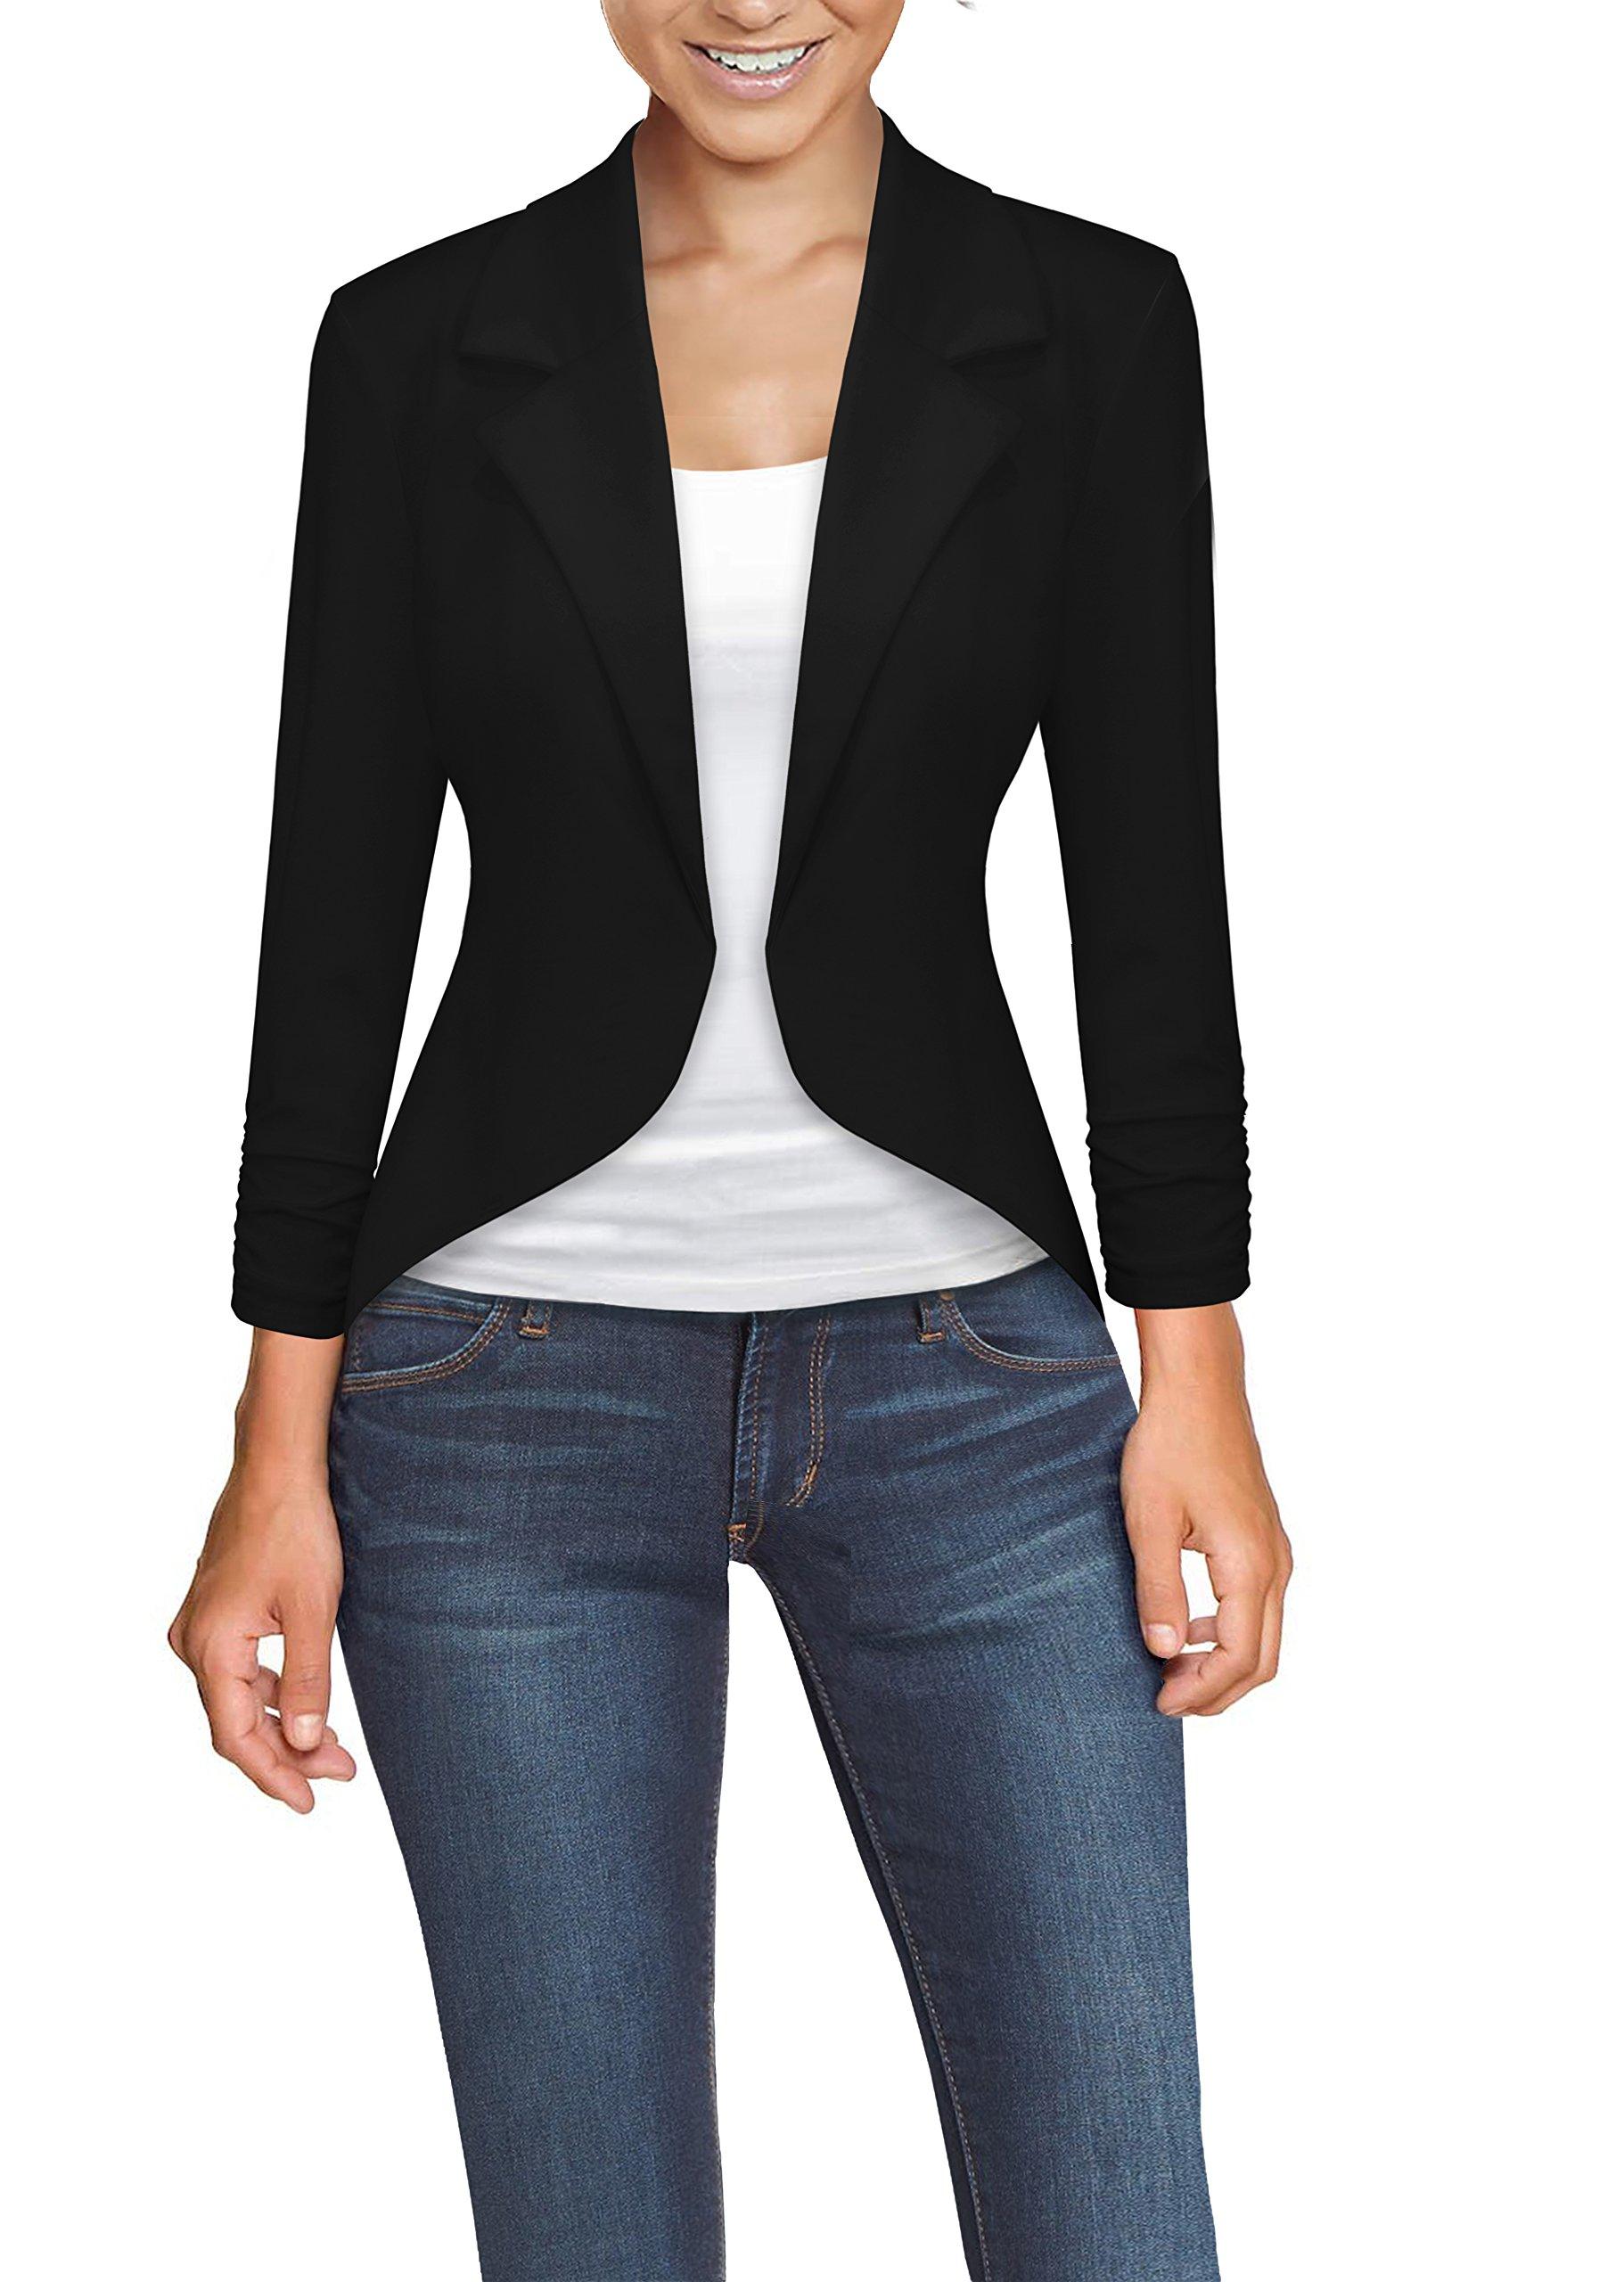 HyBrid & Company Womens Casual Work High Low Blazer Jacket JK45590 1073T Black Large